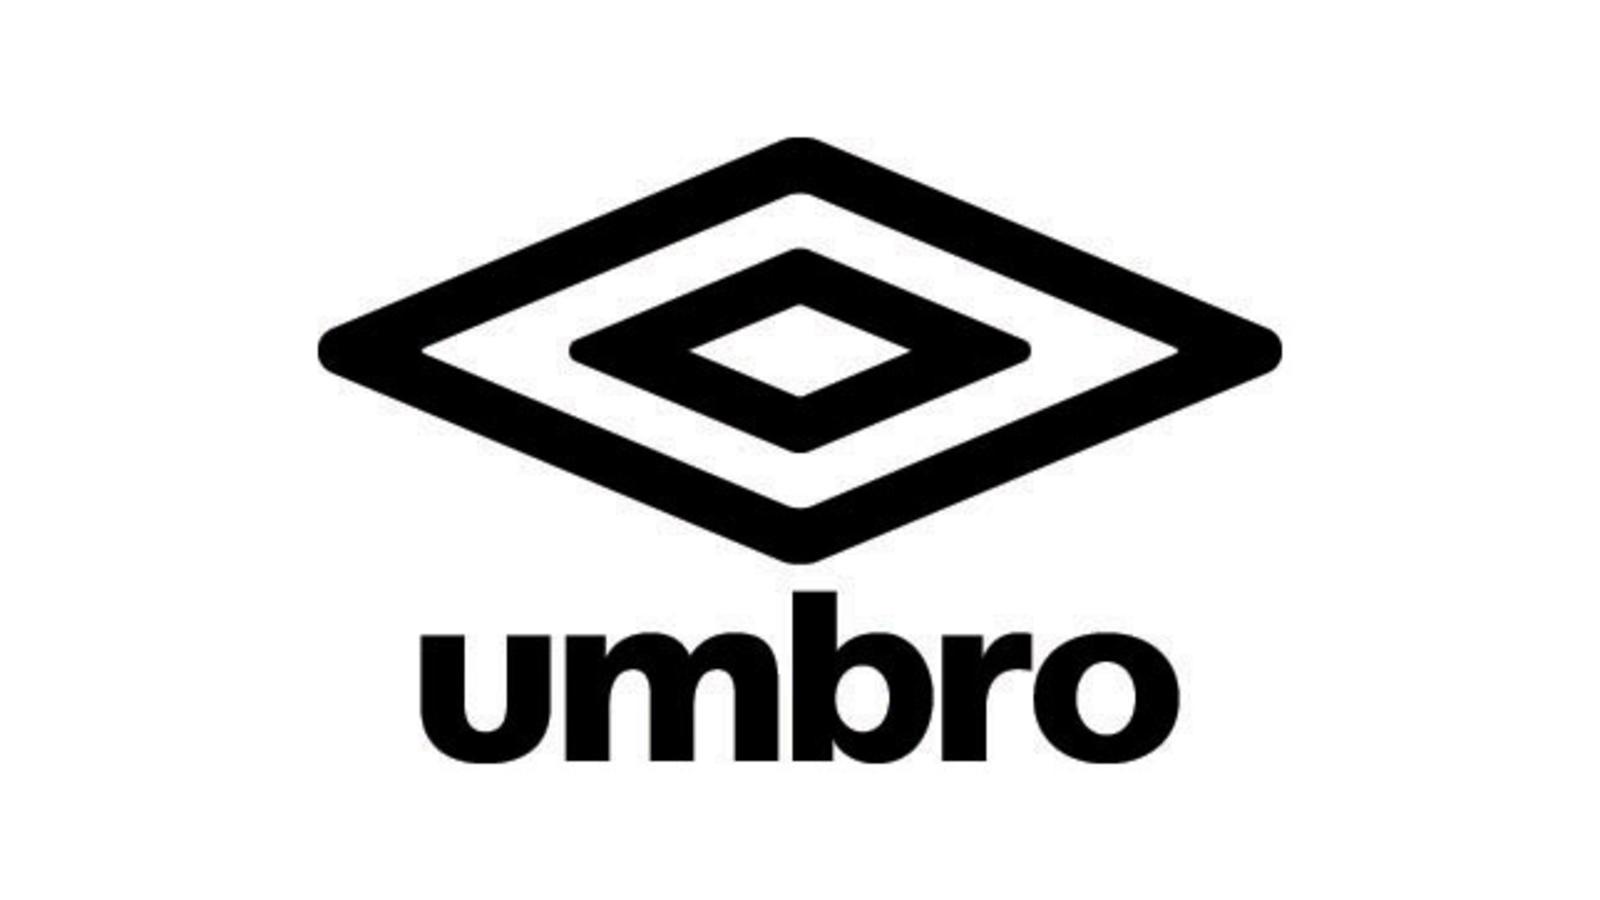 nike inc announces sale of umbro to iconix brand group nike news